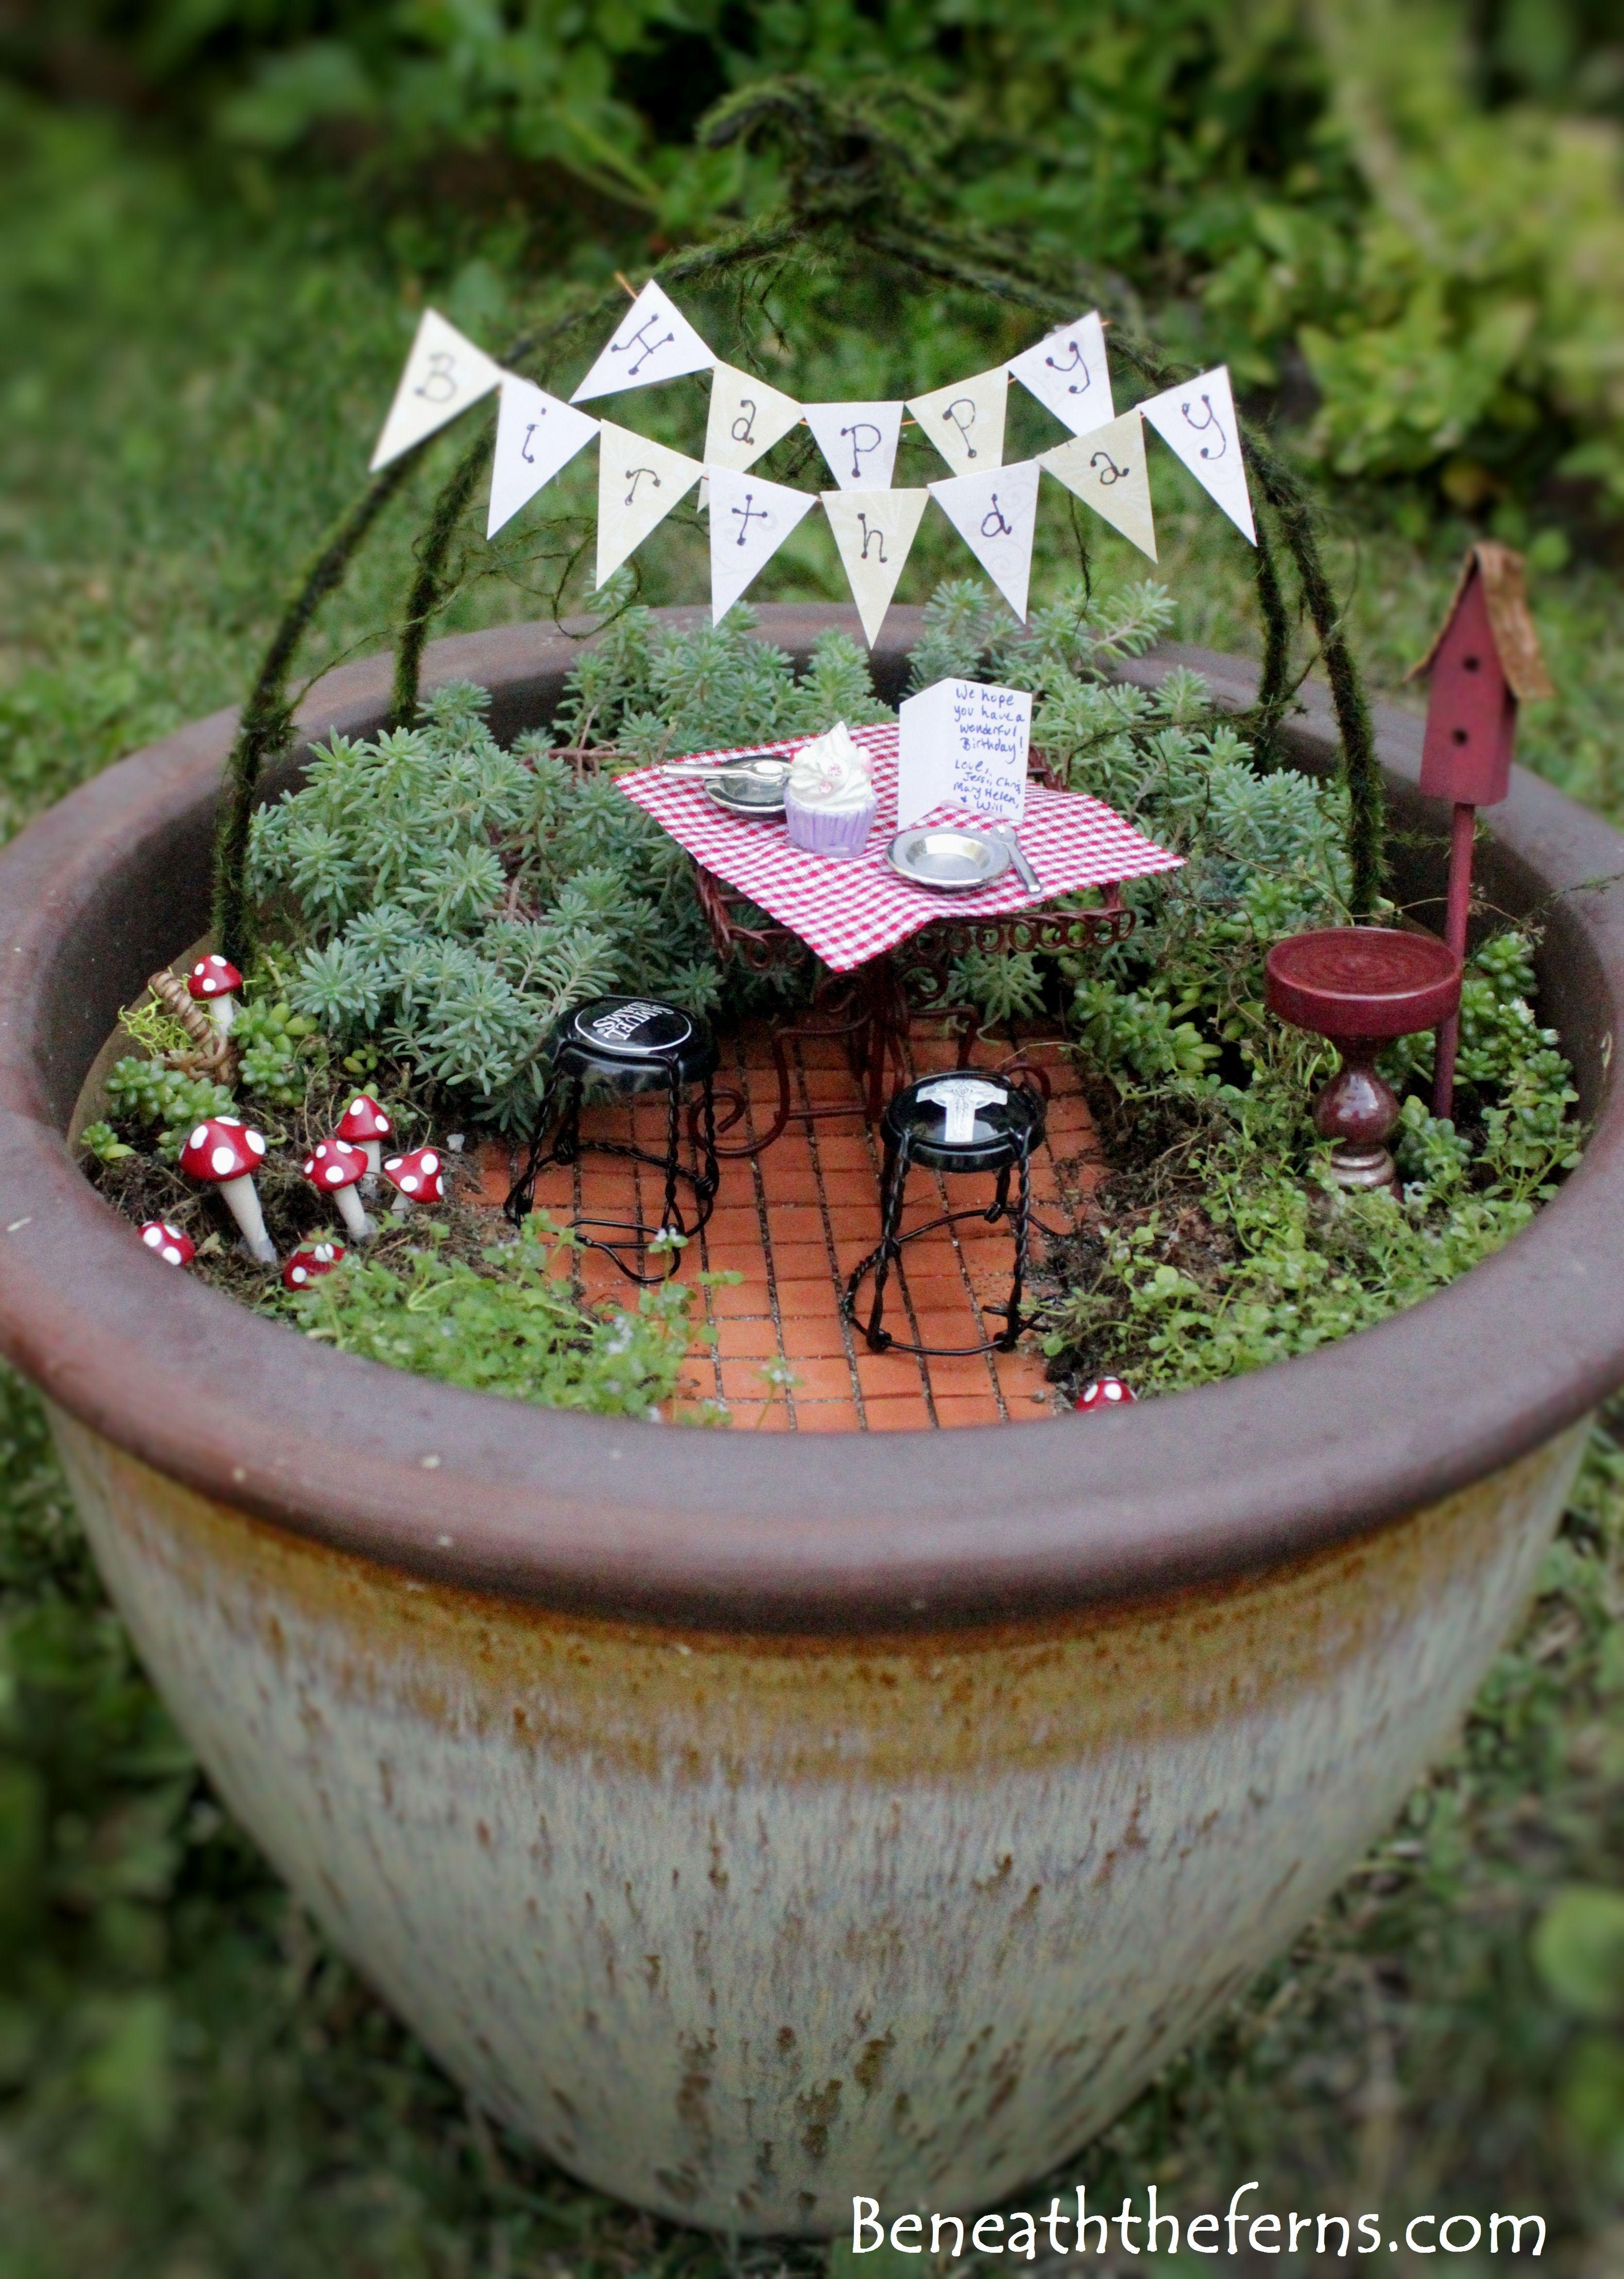 Exceptional Resultado De Imagen Para Fairy Garden. Miniature FairiesMiniature ...